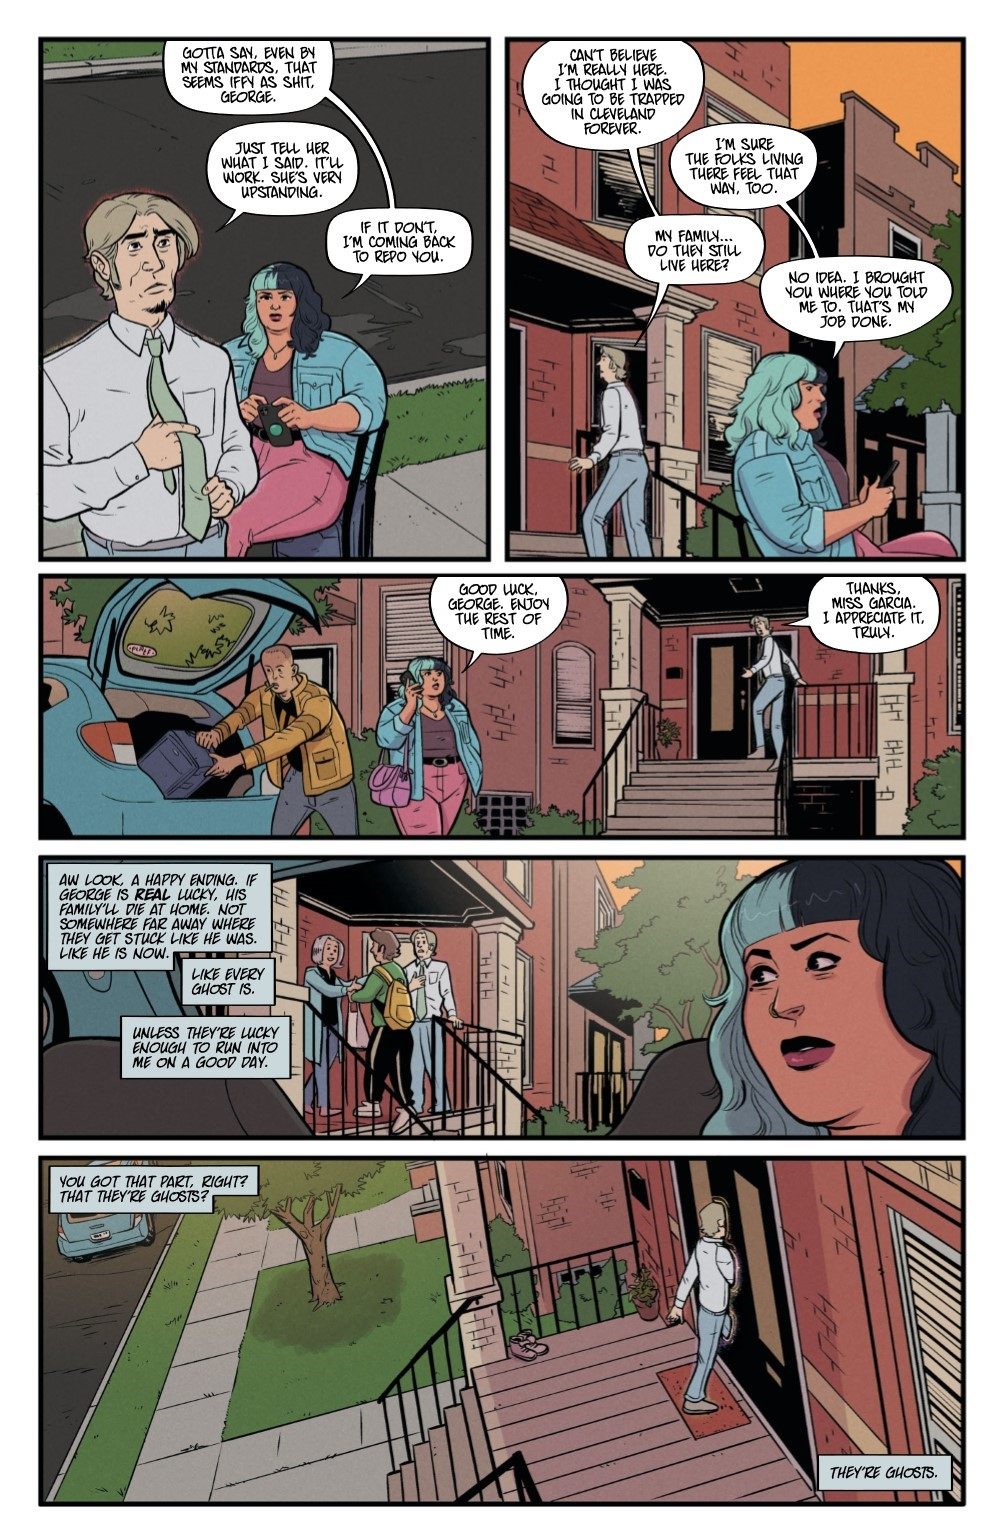 DIRTBAGRAPTURE1-MARKETING-06 ComicList Previews: DIRTBAG RAPTURE #1